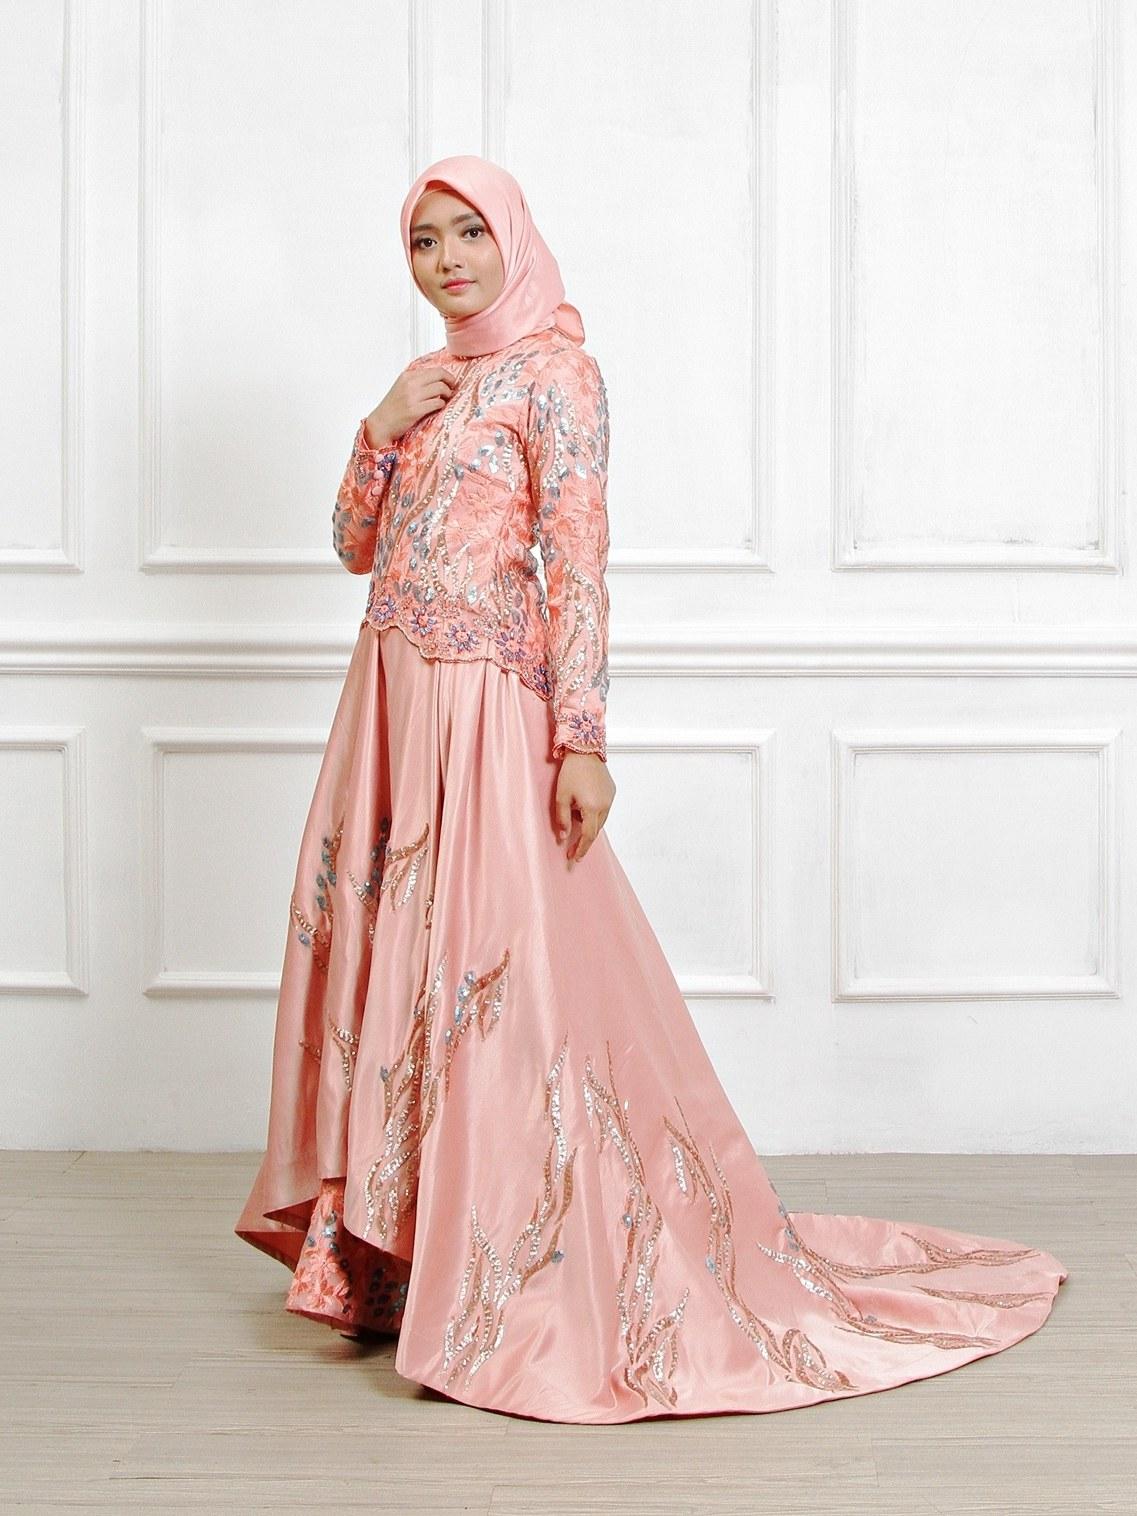 Design Sewa Baju Pengantin Muslimah Murah Y7du Sewa Perdana Baju Pengantin Muslimah Jogja Gaun Pengantin